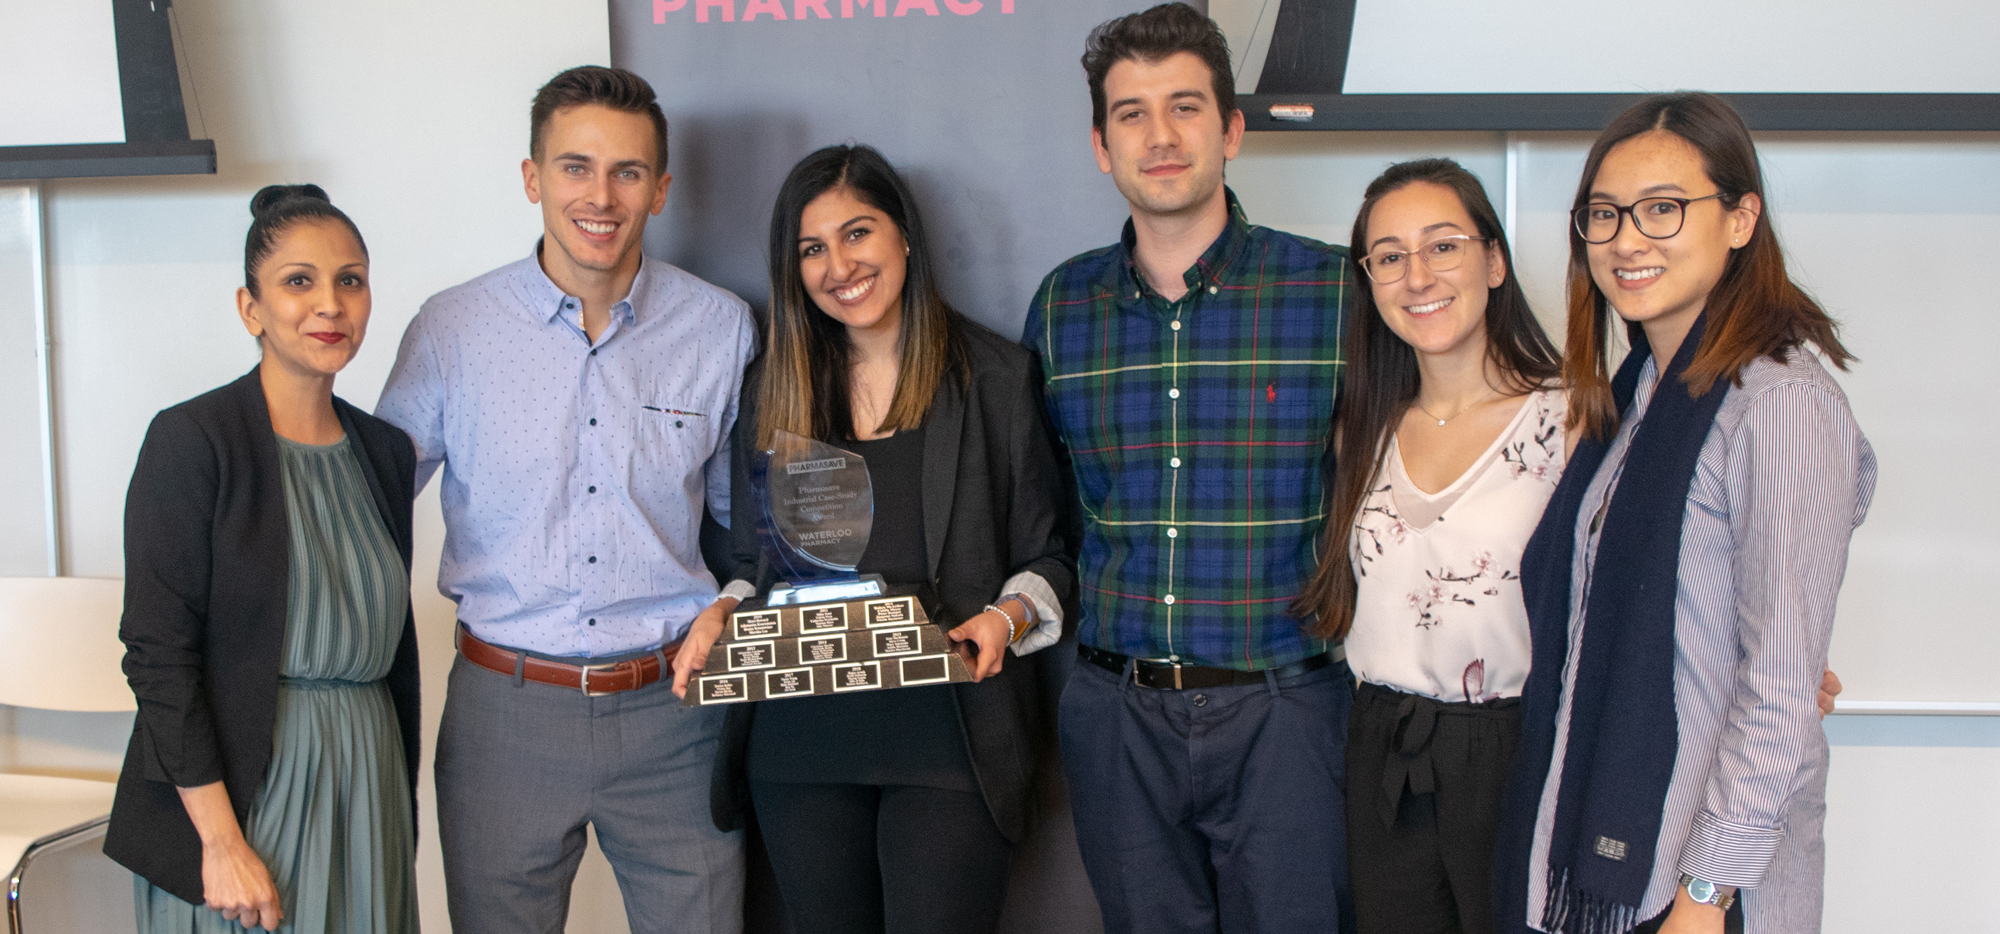 Jaspreet Dhaliwall with the students behind Oversees, Joey Champigny, Saara Manji, Arthur Catapano, Rebecca Conti, Lee Pham